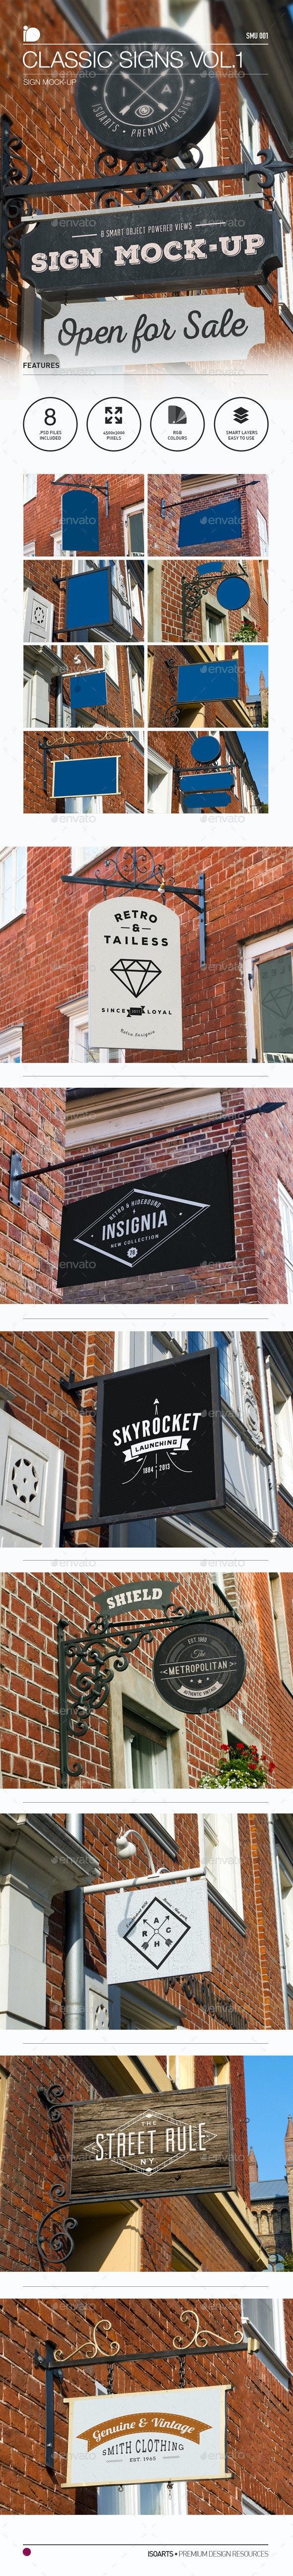 Sign Mock-Up • Classic Signs Vol.1 - Signage Print